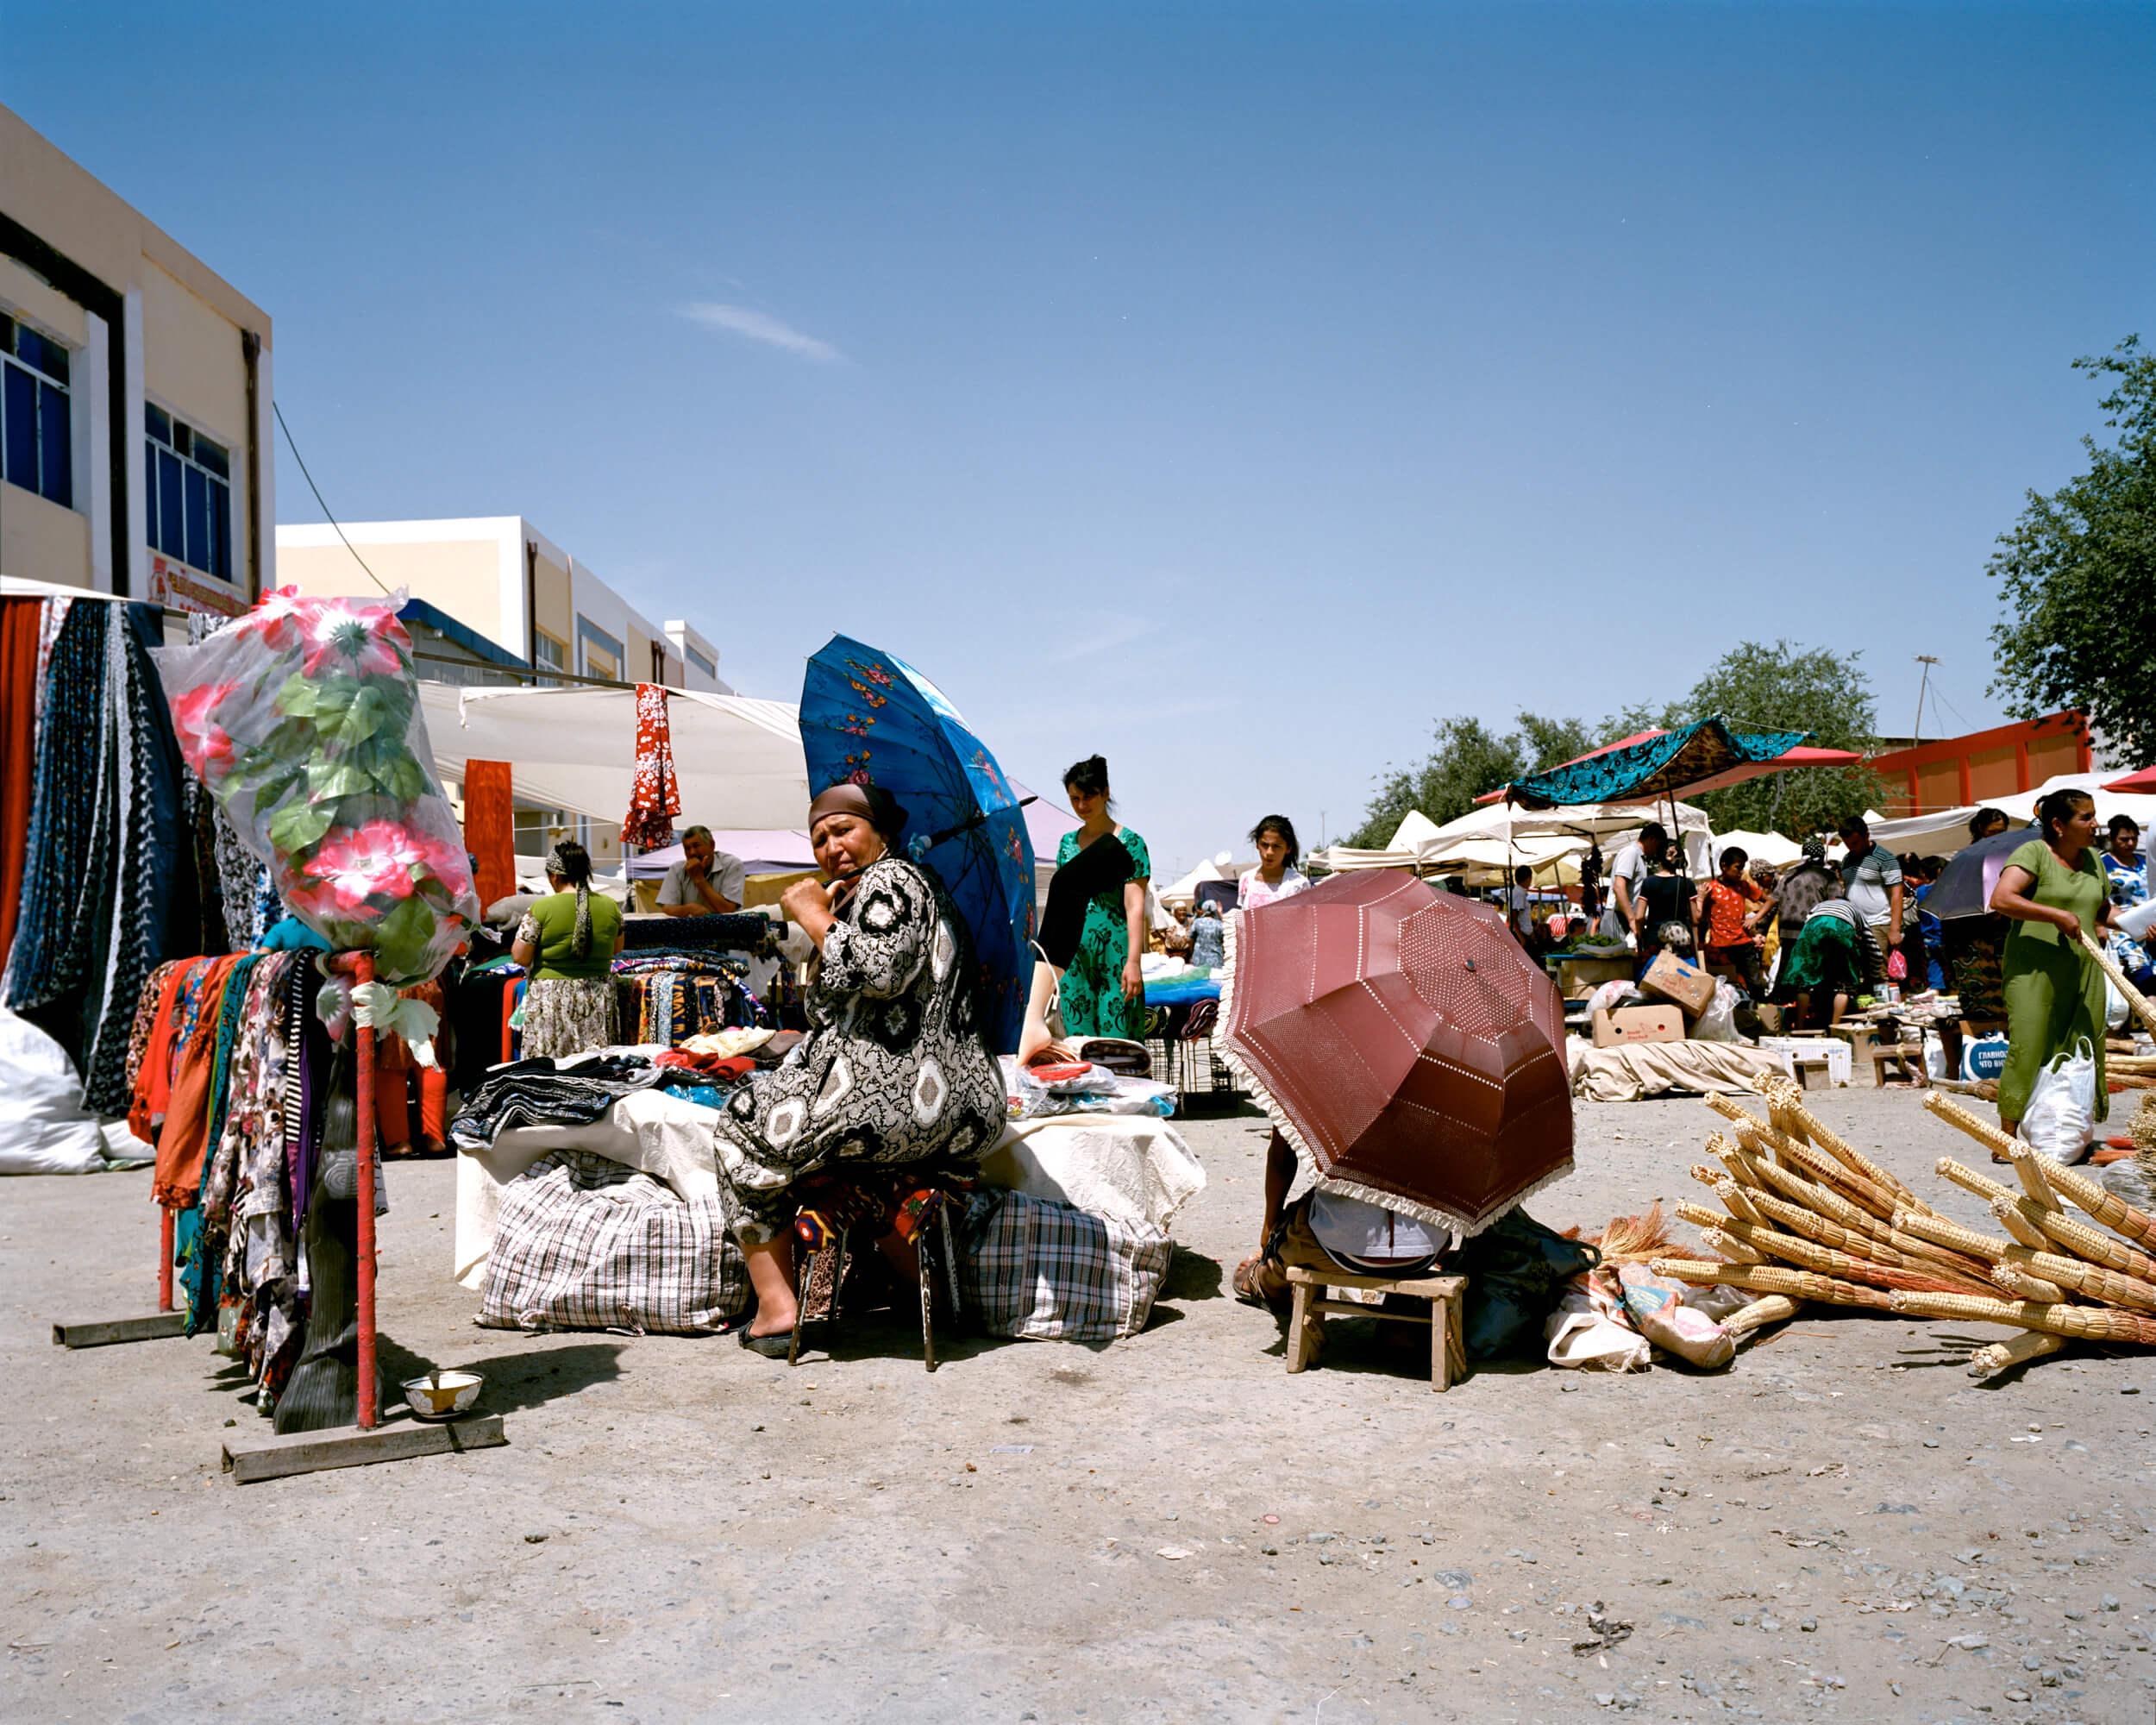 marco-barbieri-water-in-the-desert-10.jpg